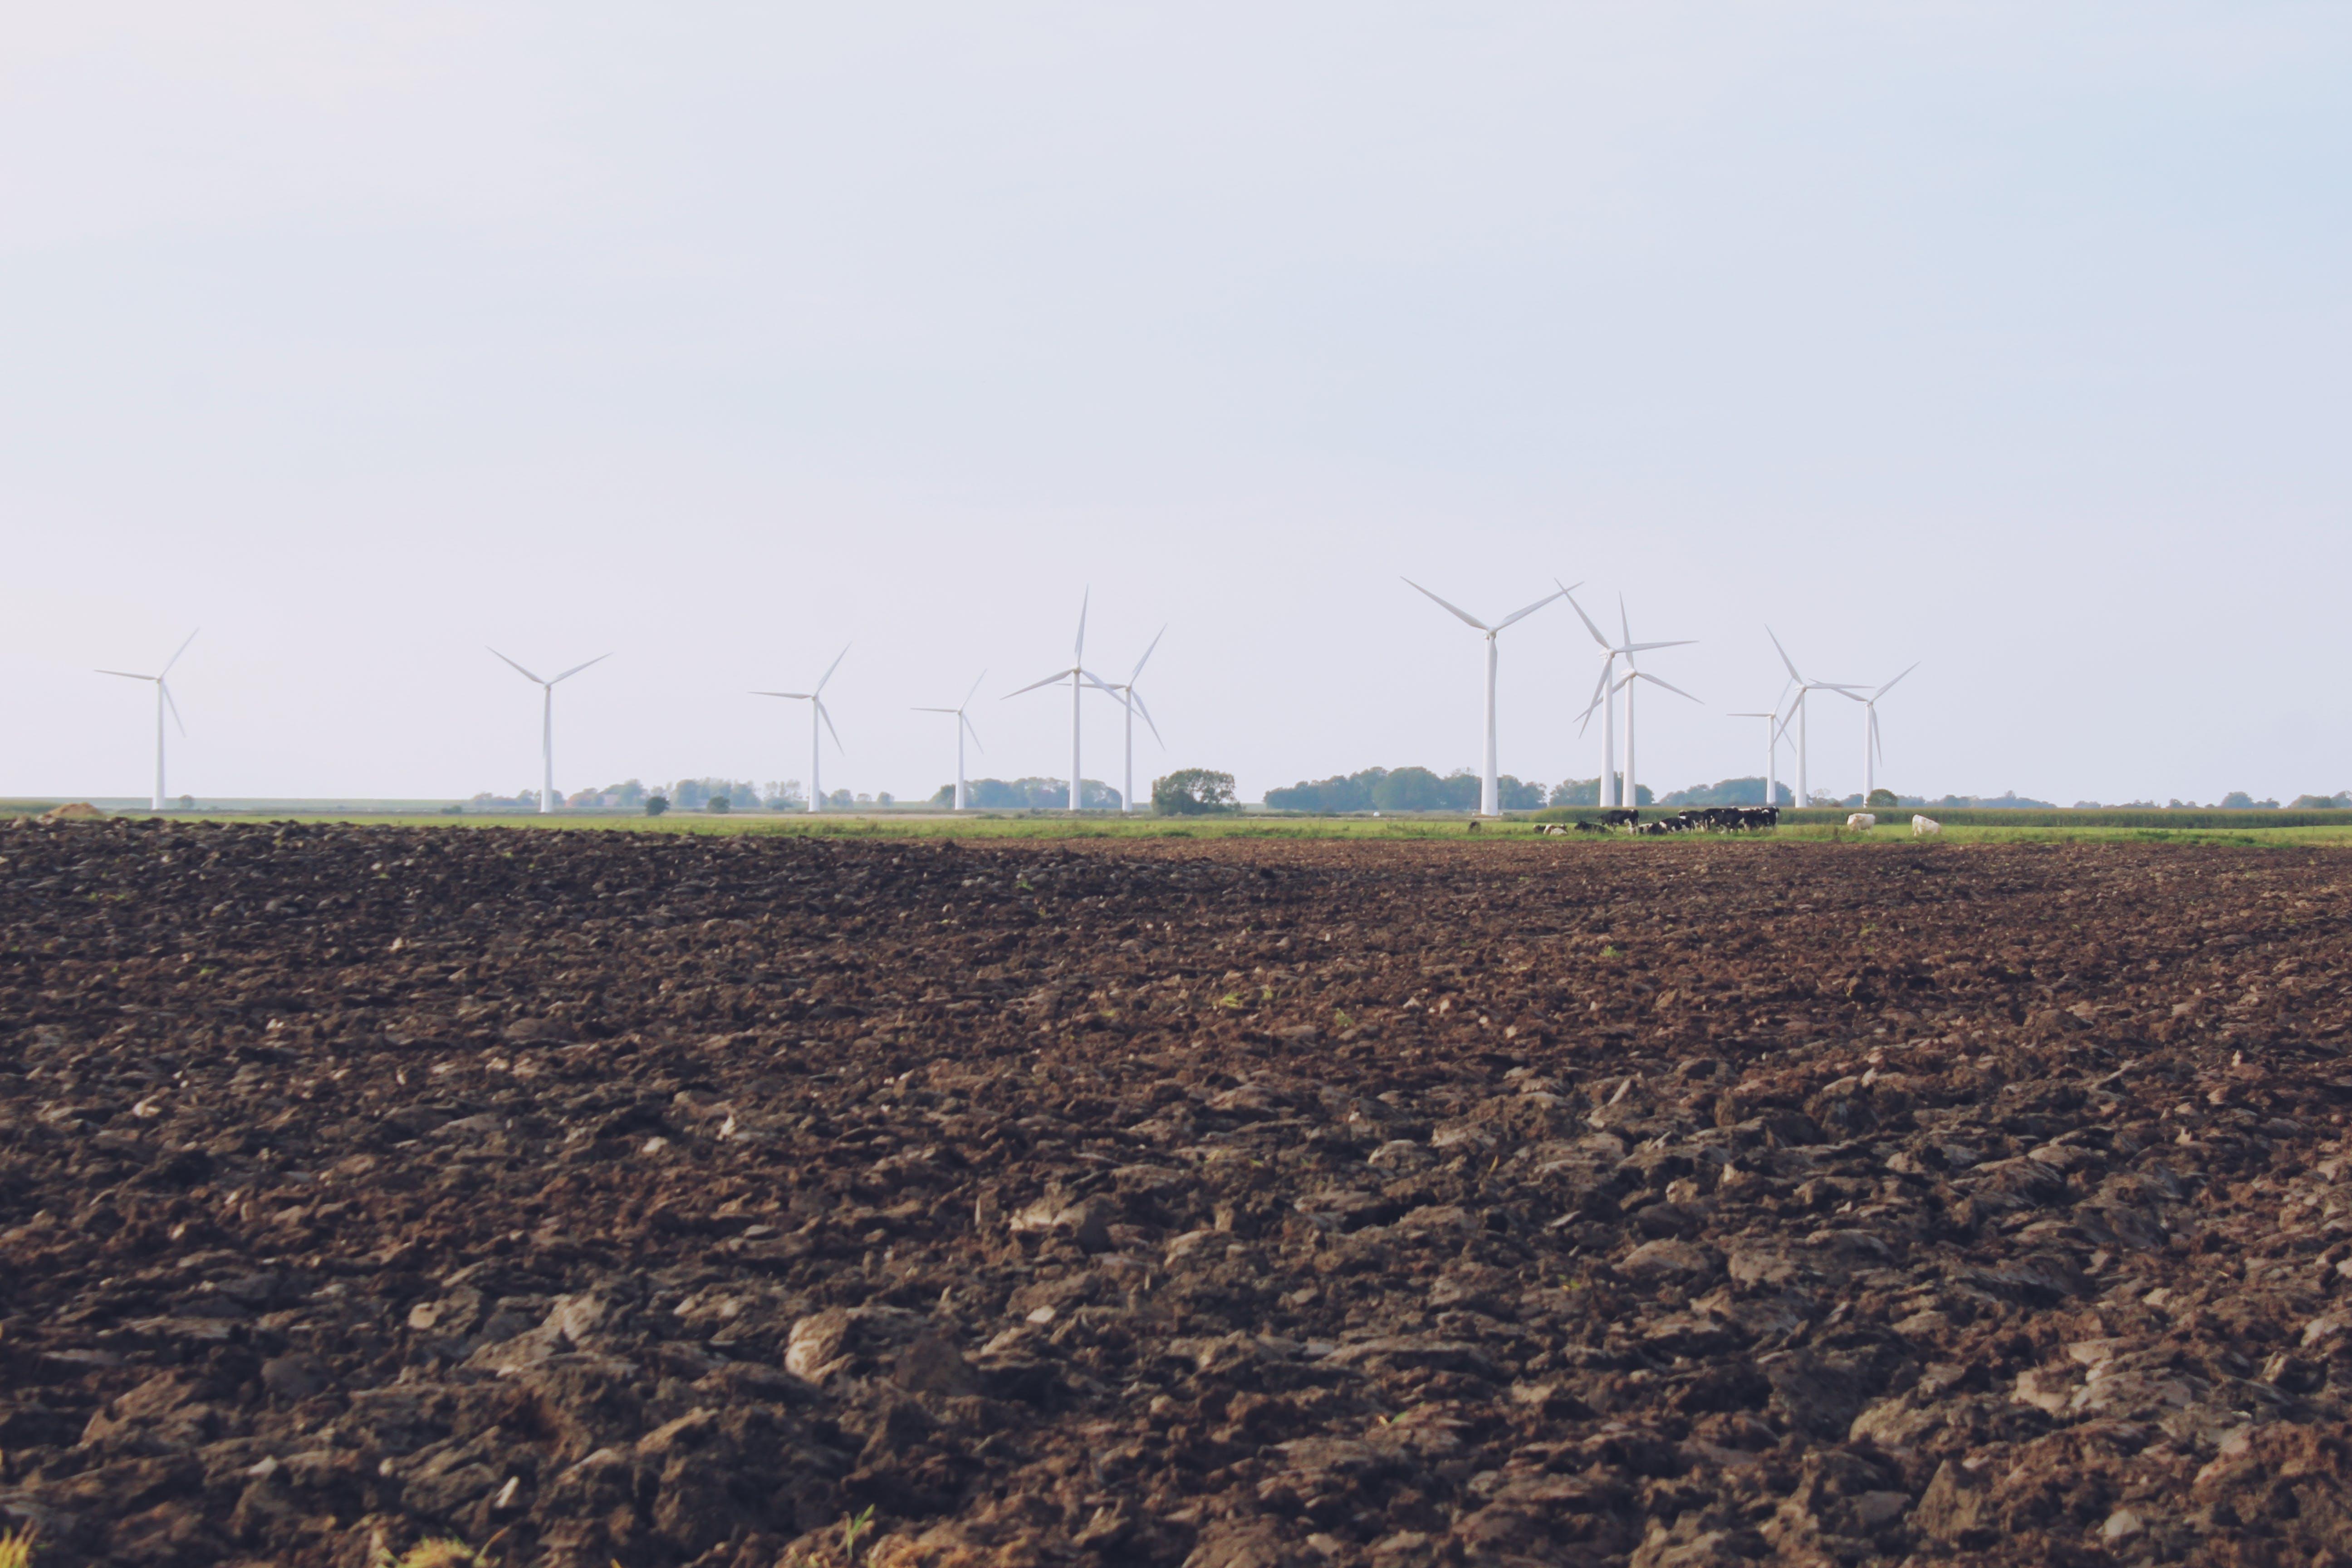 ackerland, kühe, windkraft